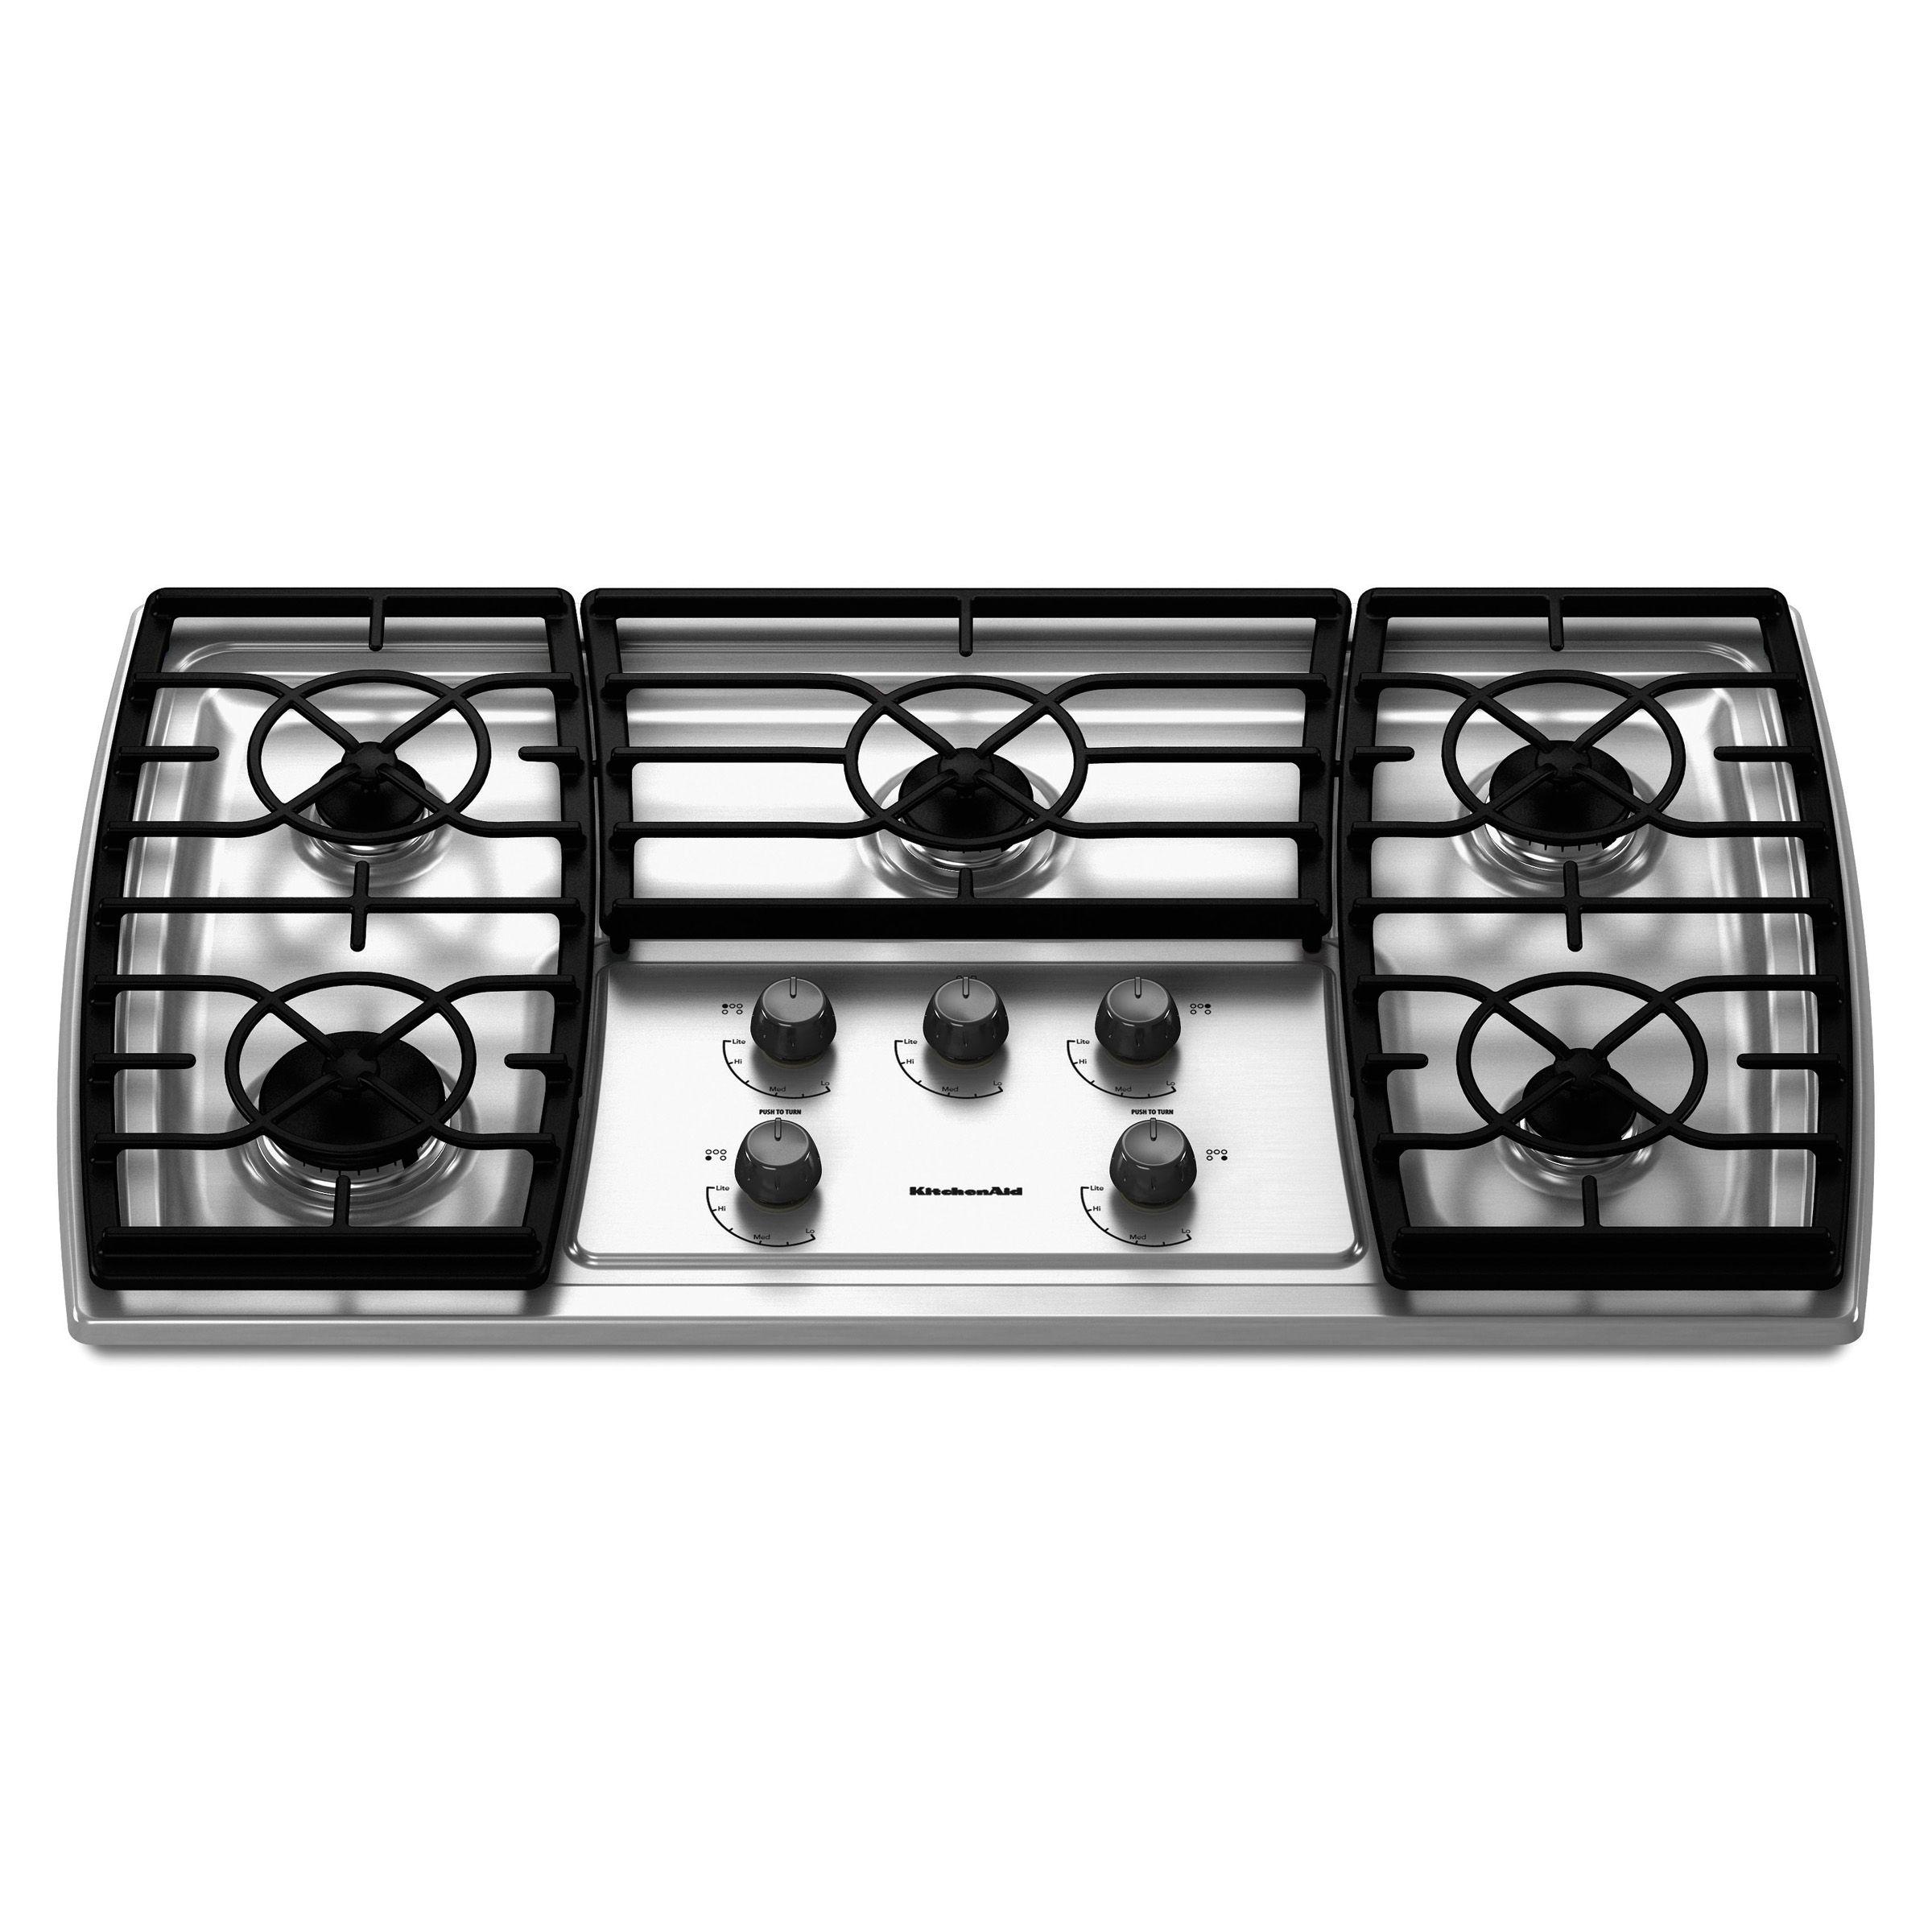 sears kitchen appliances faucets kohler kitchenaid kgck366vss 36